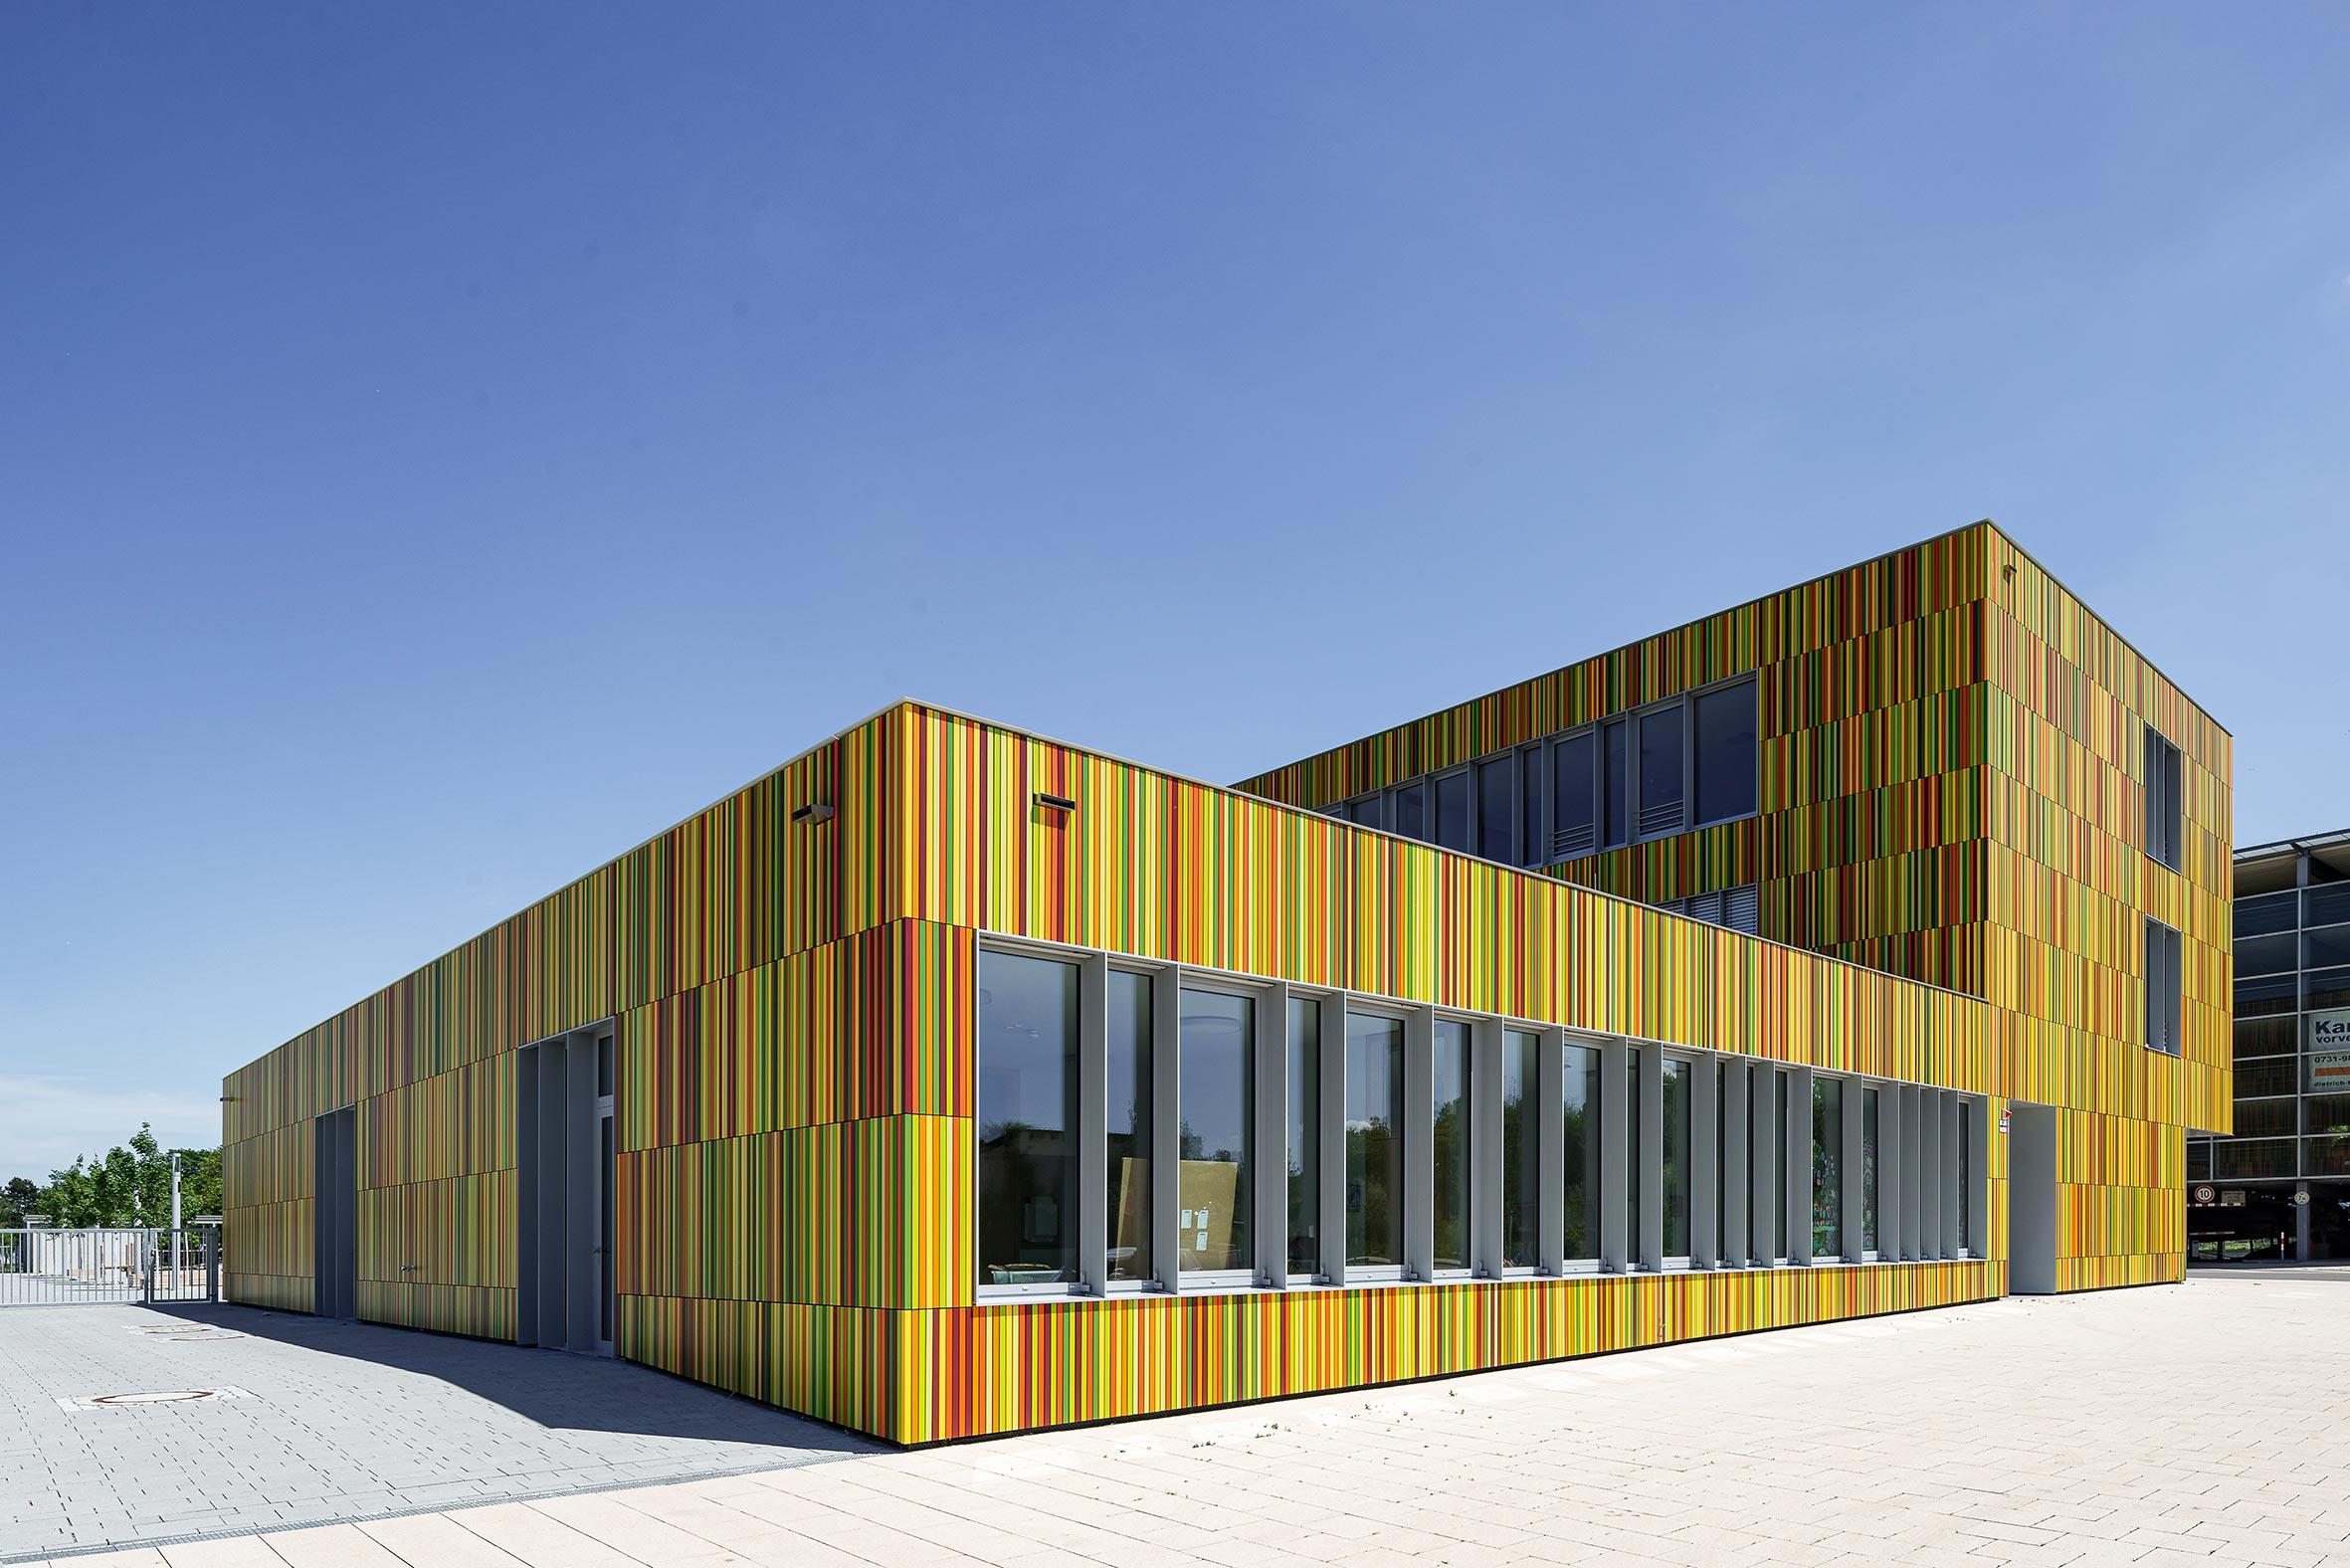 Architekturfotografie Mark Twain Grundschule Neu-Ulm. Foto: Gerd Schaller / BAUWERK PERSPEKTIVEN